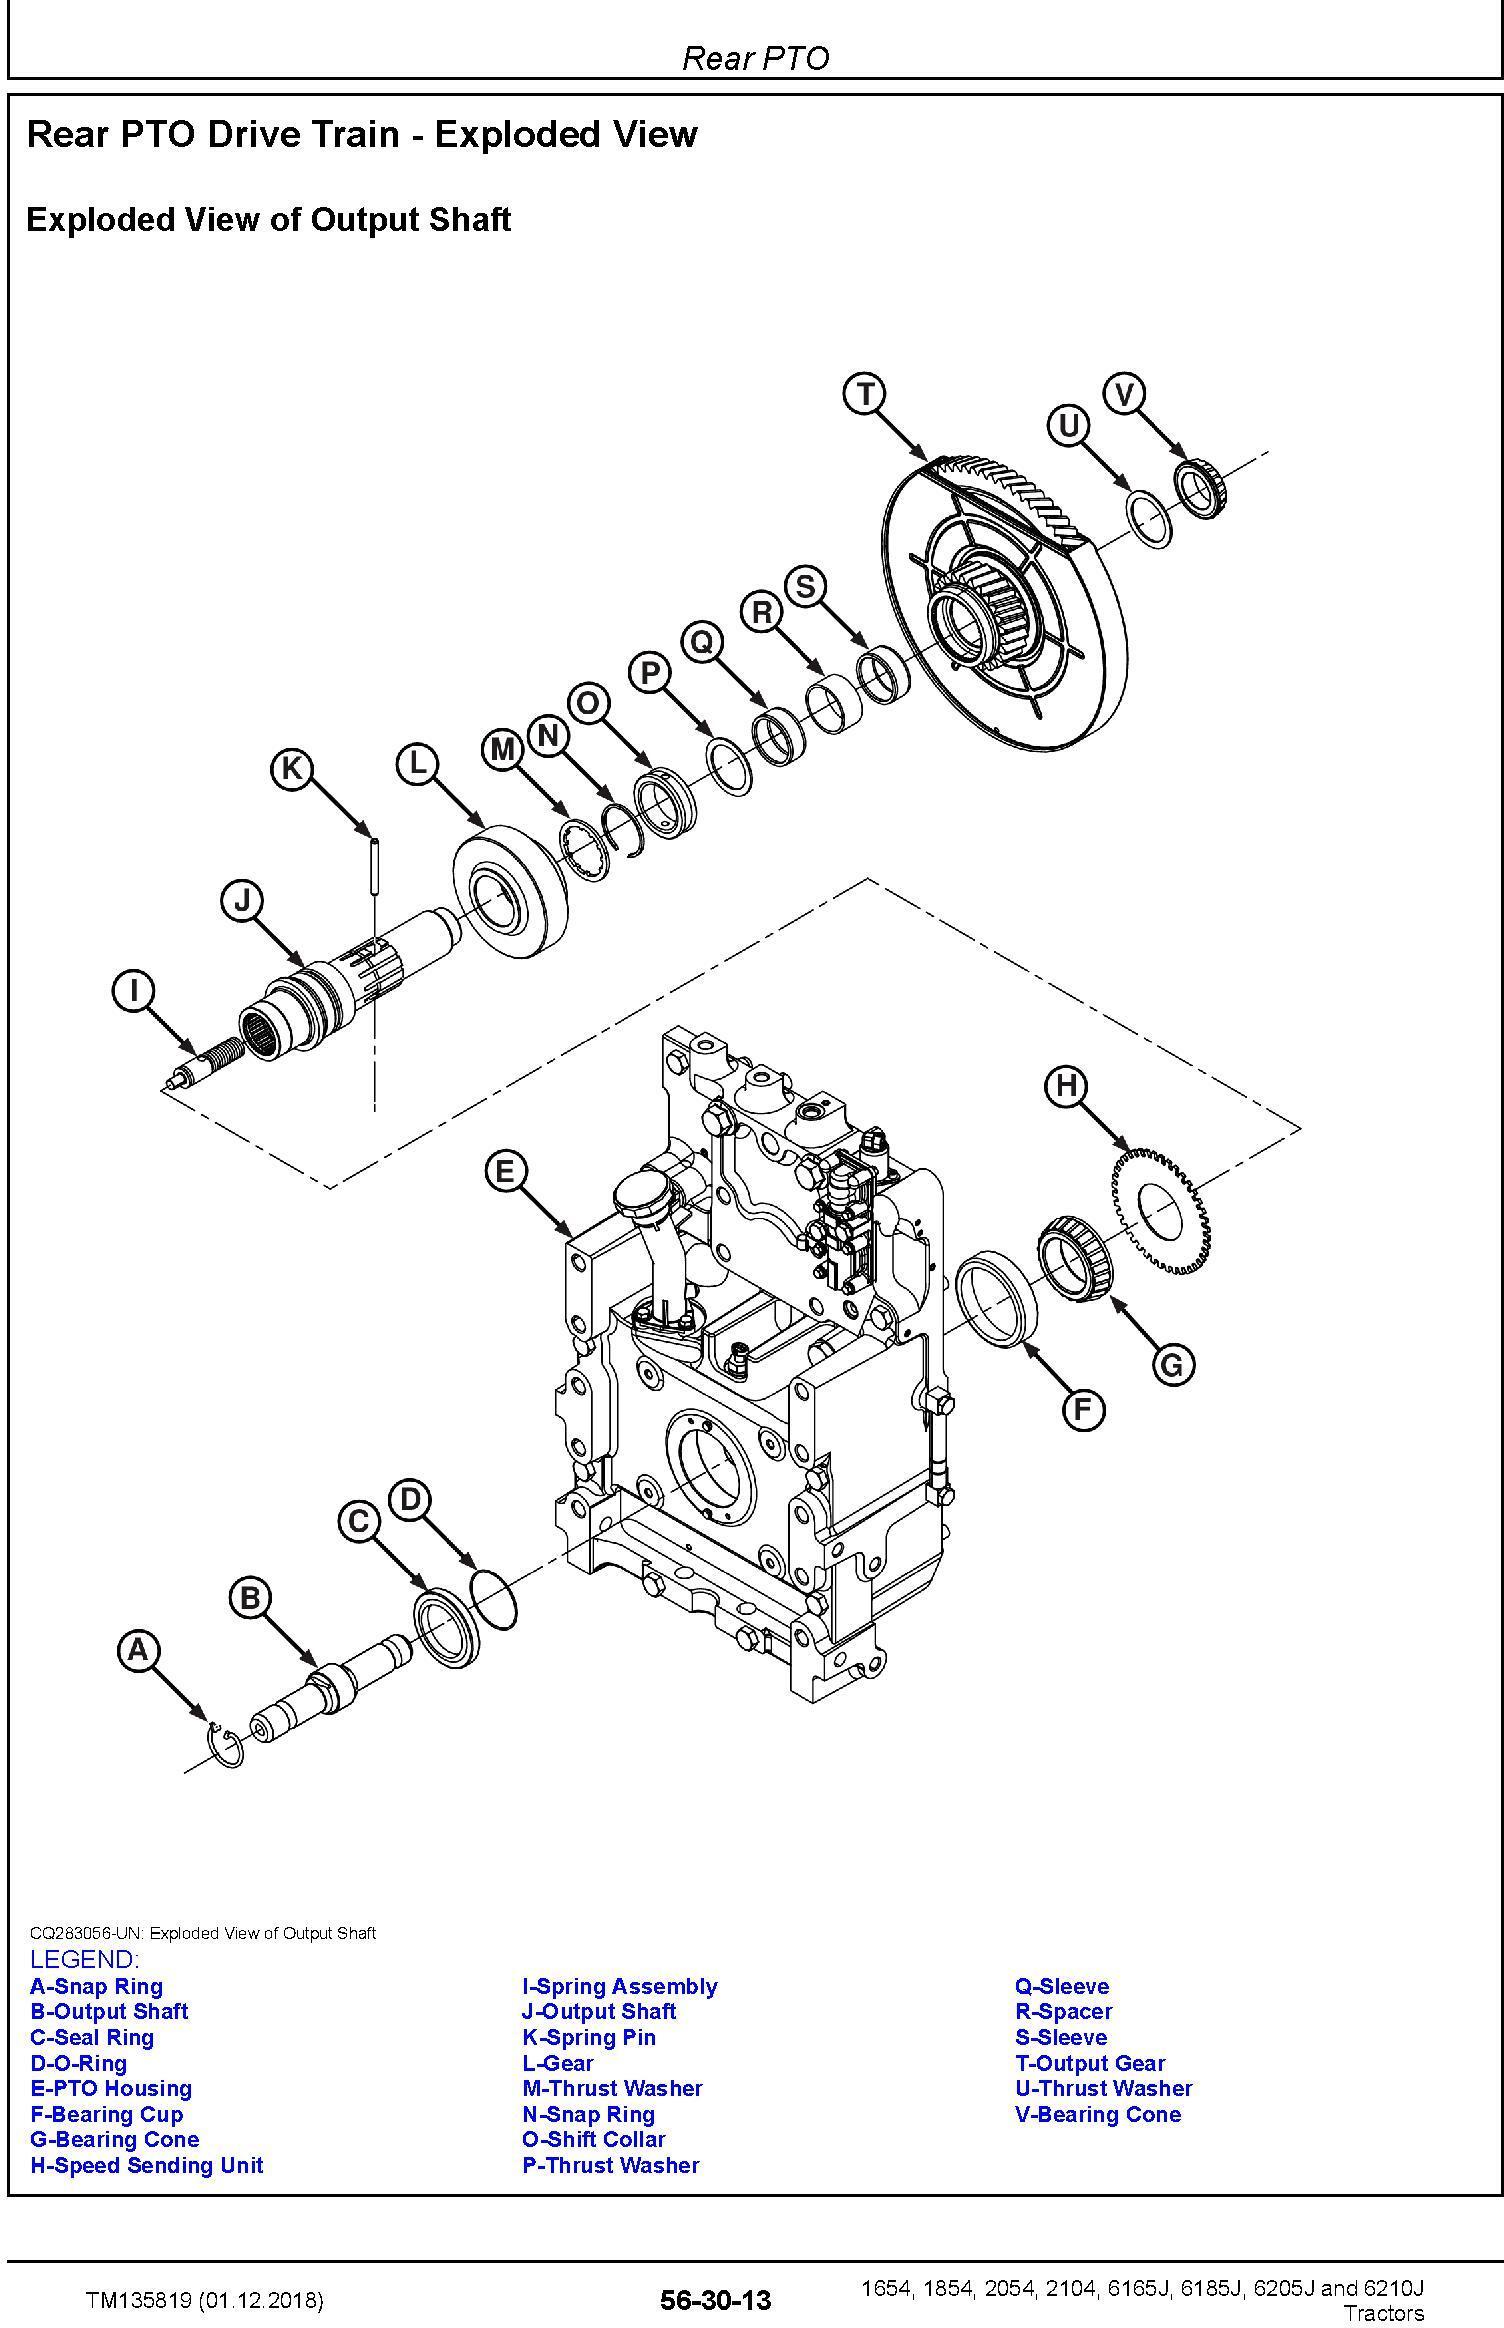 John Deere 6165J(6J-1654), 6185J(6J-1854), 6205J(6J-2054), 6210J(6J-2104) Tractors MY15 Repair Manual (TM135819) - 2